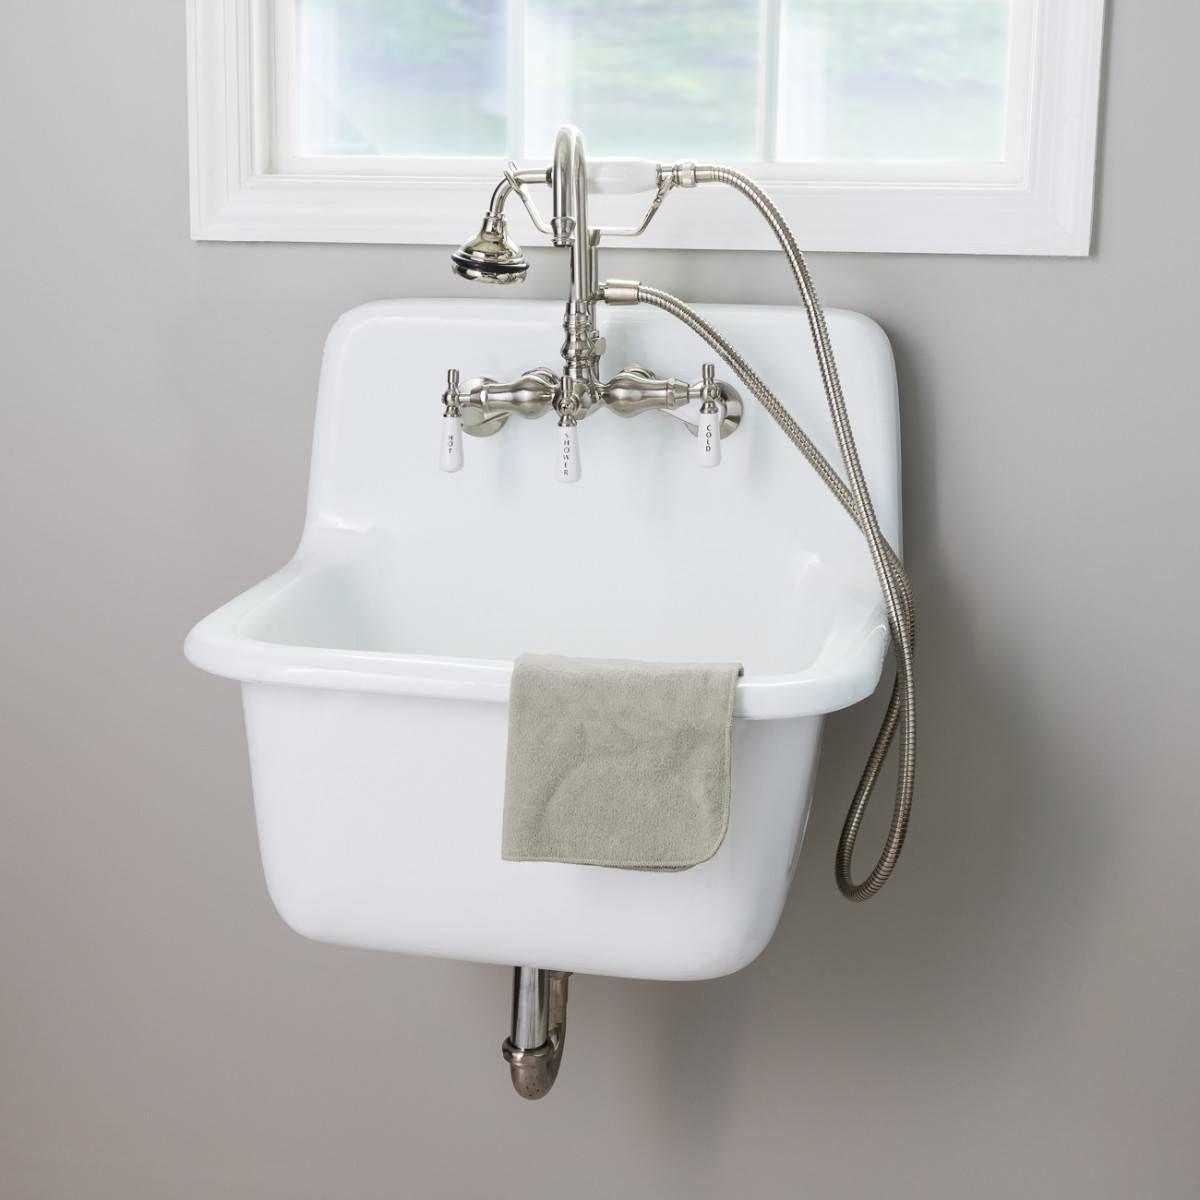 22 Inch Cast Iron High Back Deep Utility Sink Utility Sink